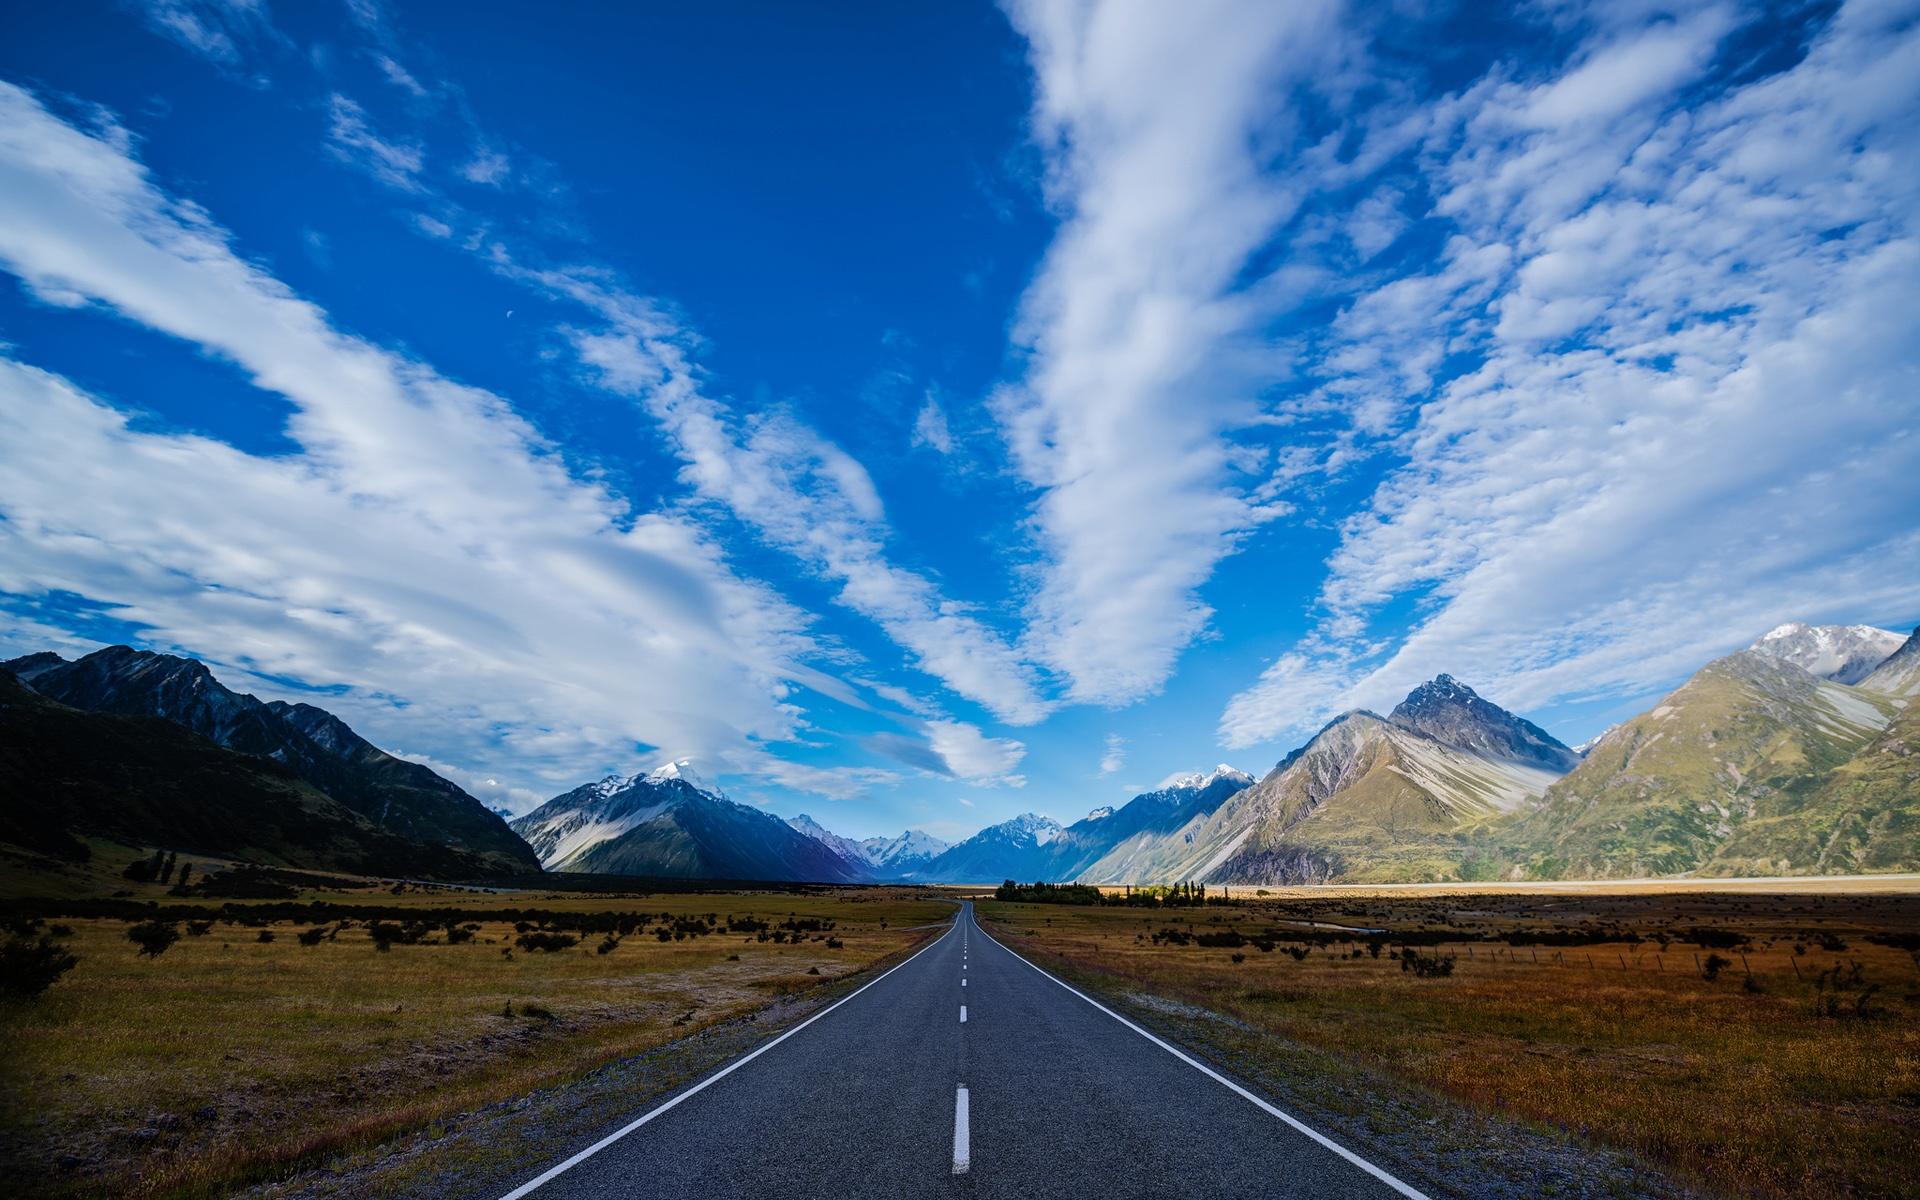 neuseeland autobahn stra e berge blauer himmel wei e wolken 1920x1200 hd hintergrundbilder. Black Bedroom Furniture Sets. Home Design Ideas